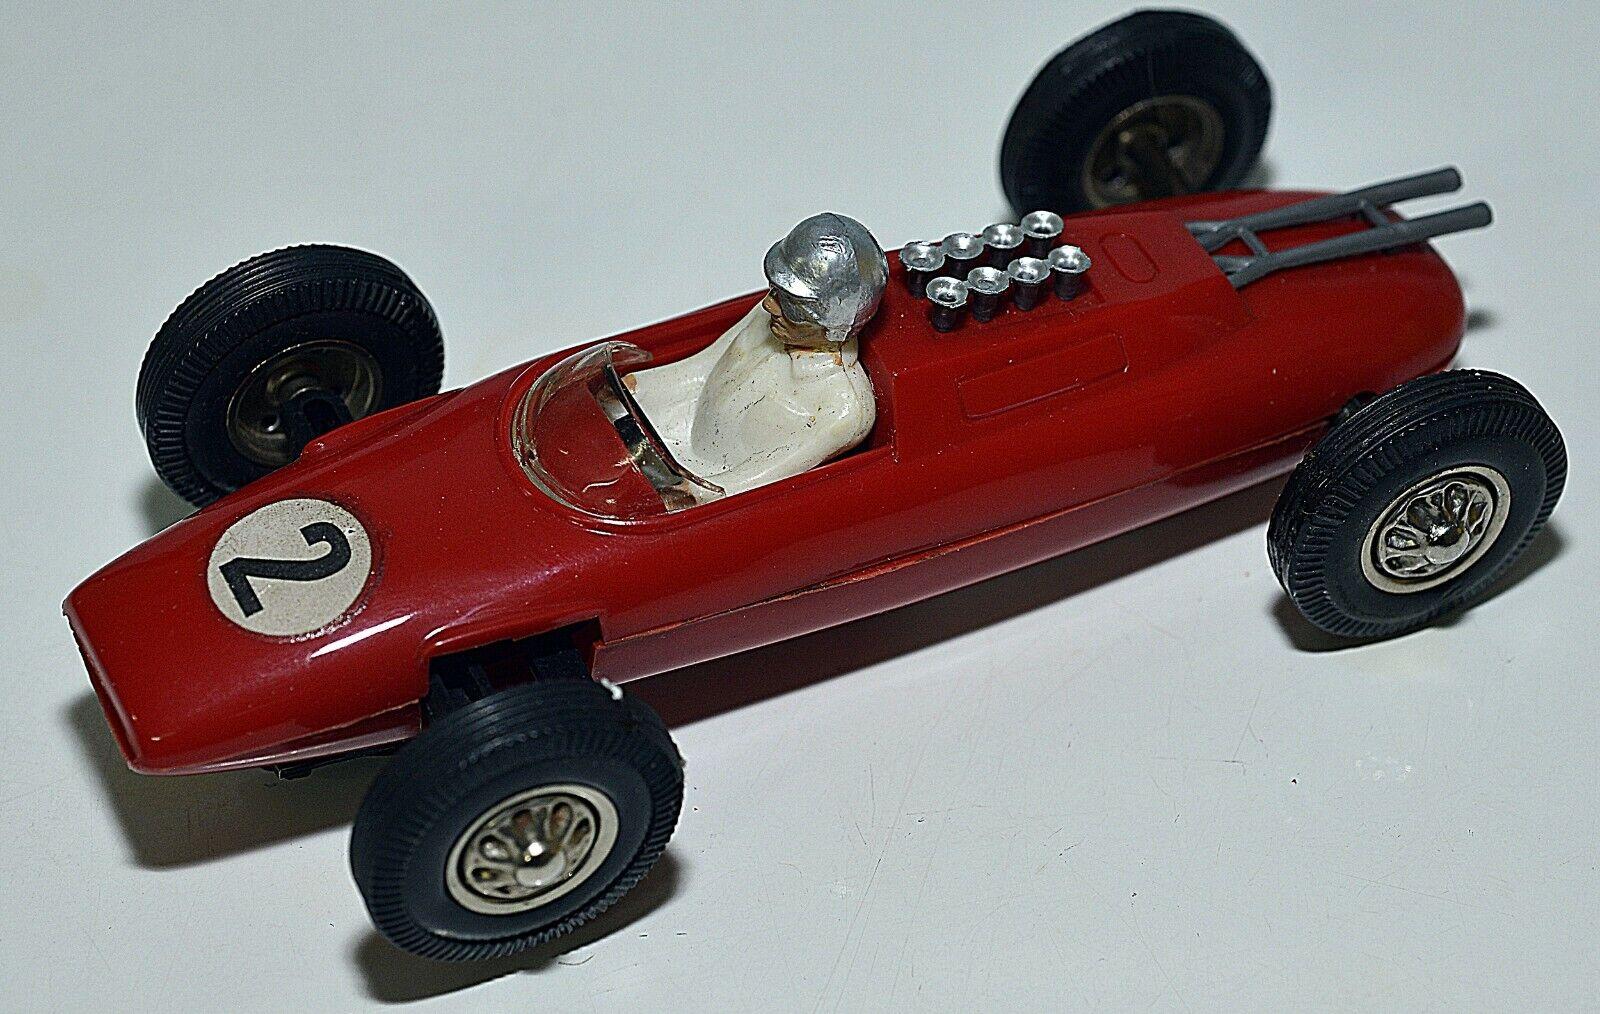 Carrera-Universal-132-Lotus Climax rot glänzend SV 3, Nr. 40402 Vitrinenfahrzeug